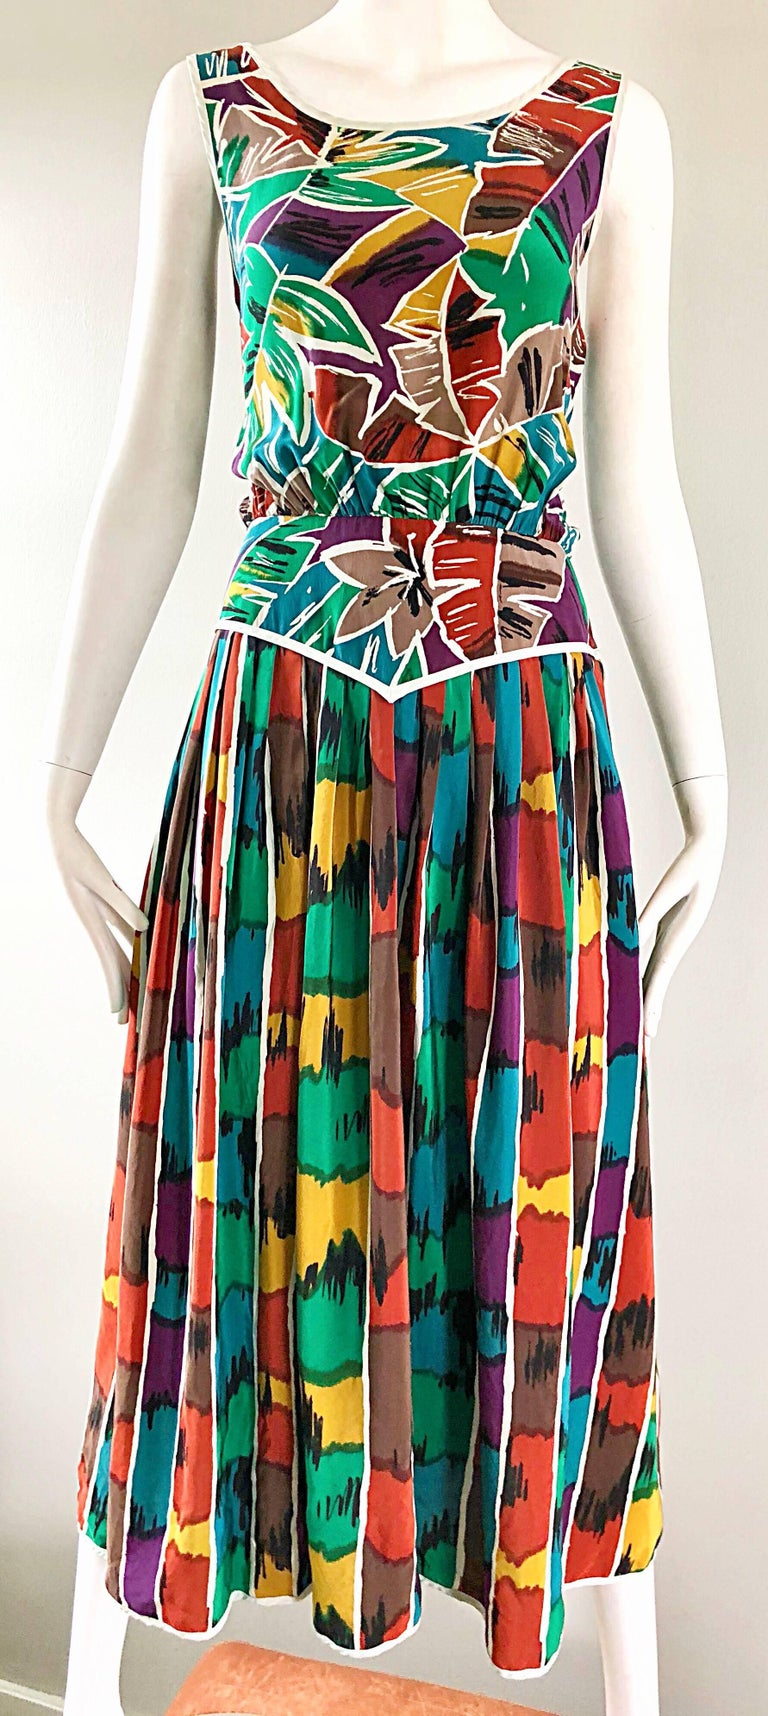 Vintage Oscar de la Renta Size 8 / 10 Kaleidoscope Print Silk Sleeveless Dress For Sale 3